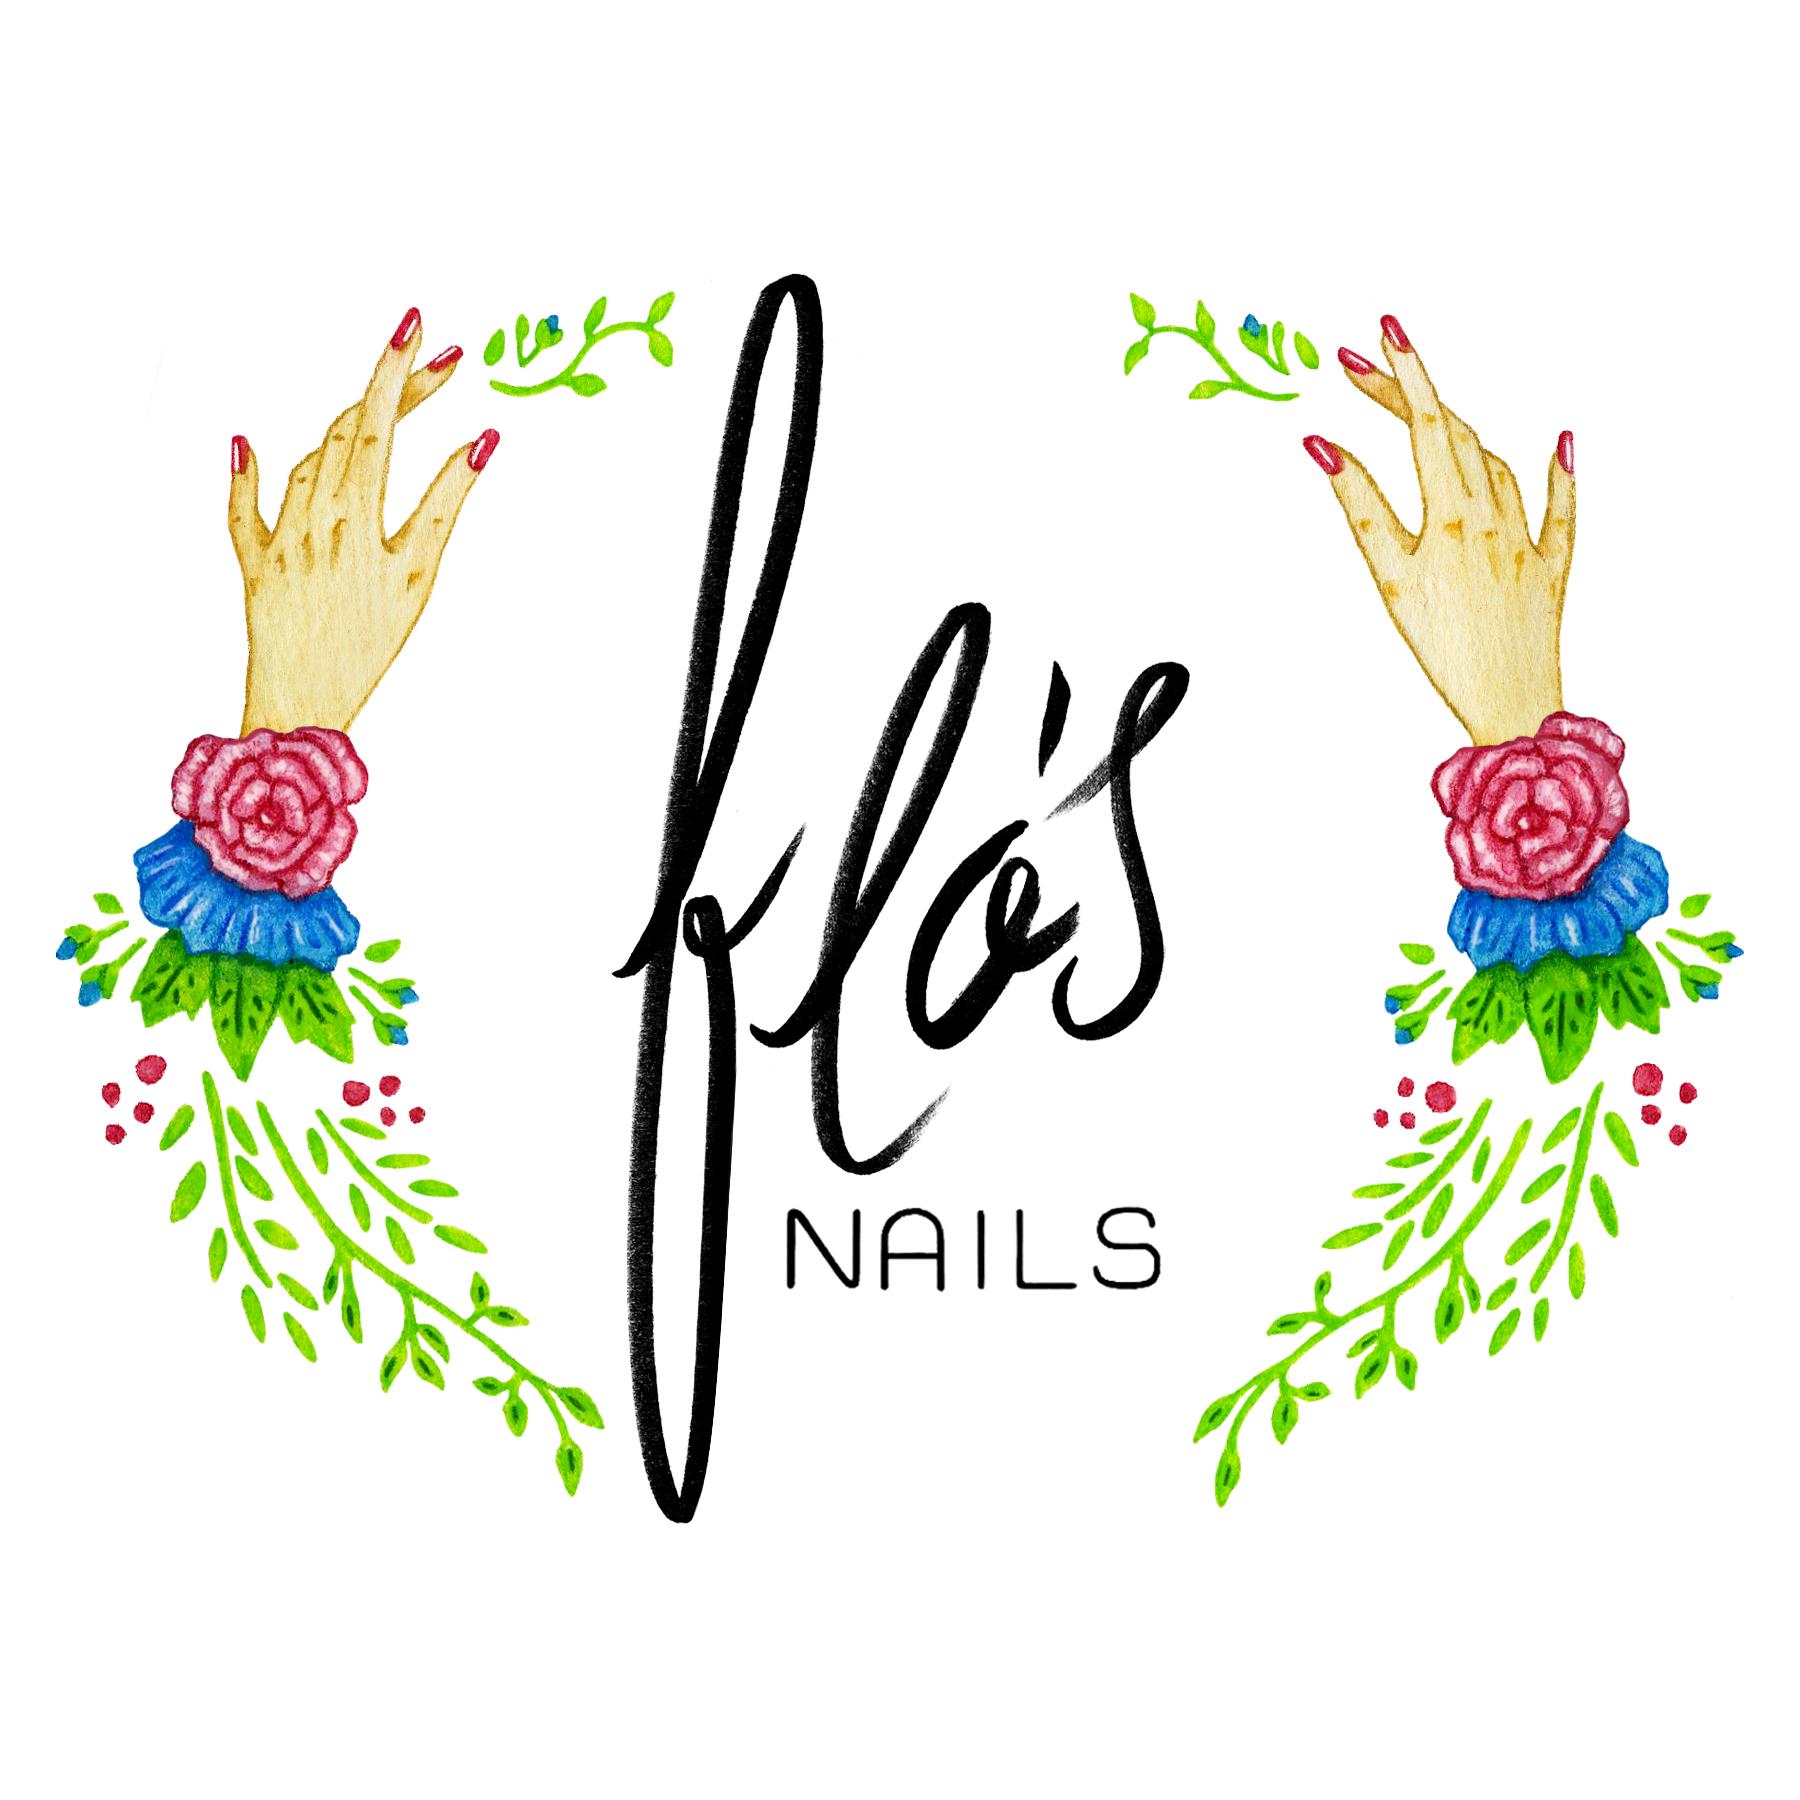 FLO'S NAILS_FINAL.jpg